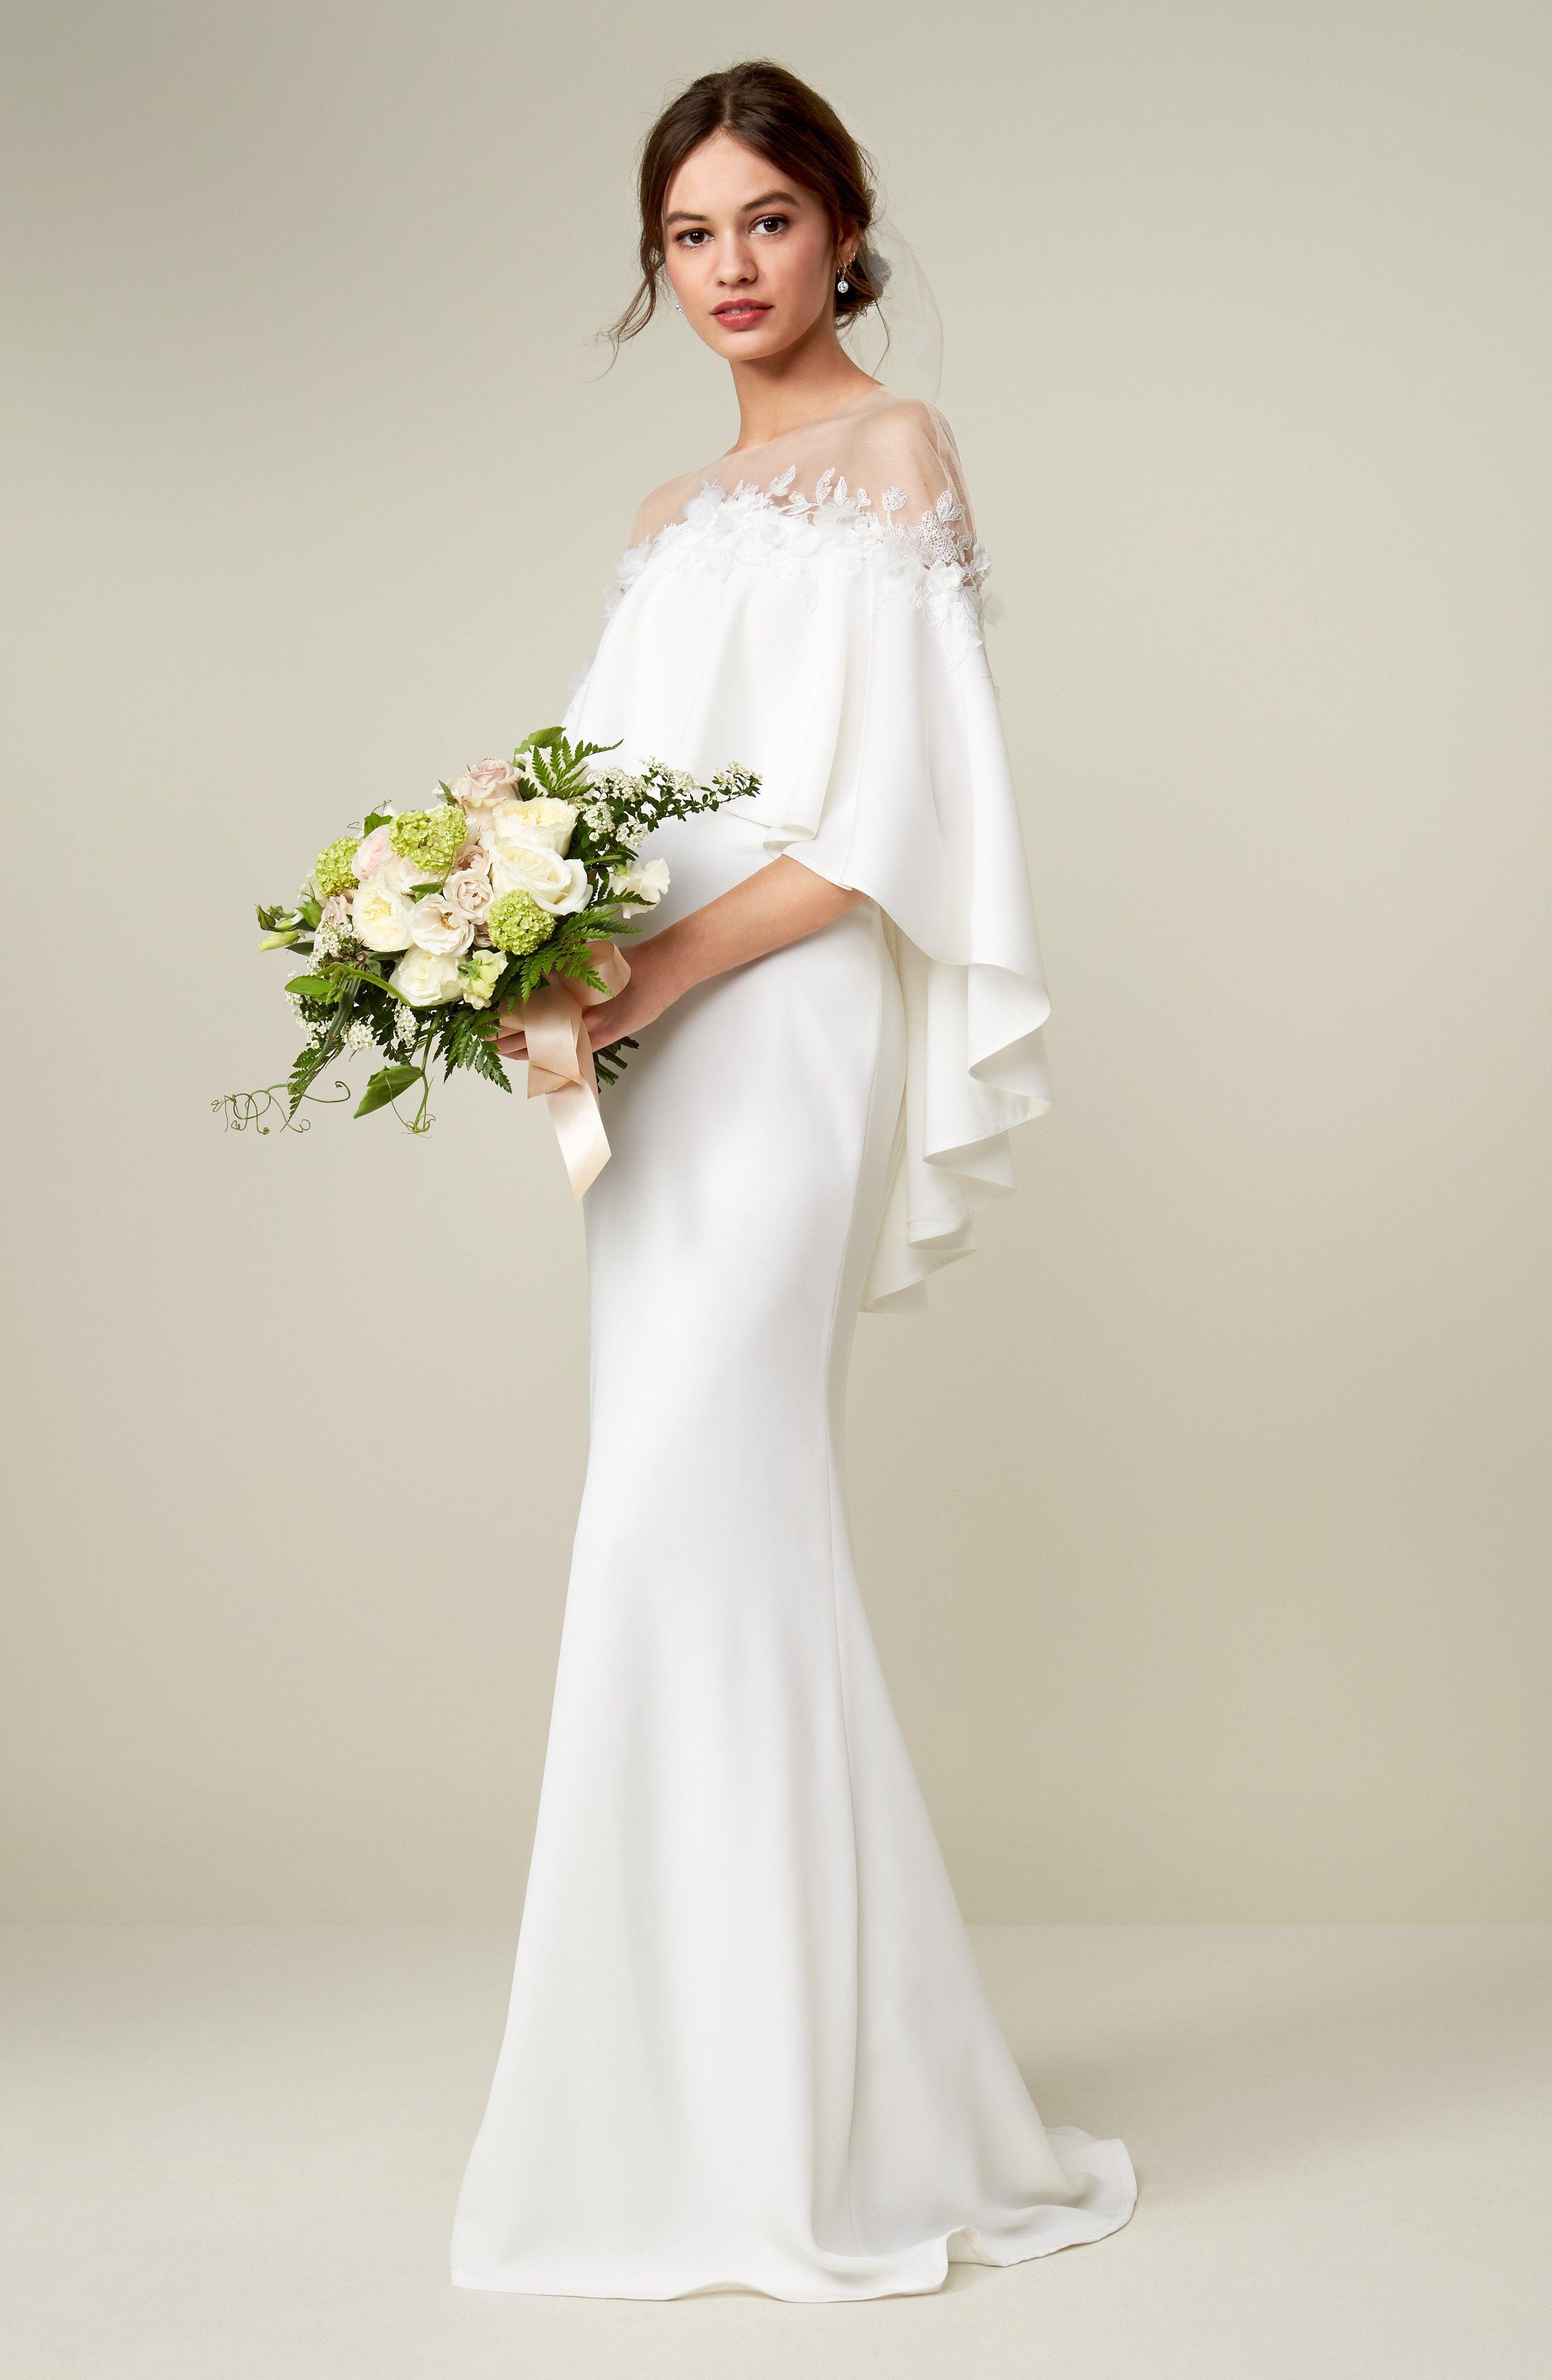 Off The Shoulder Popover Gown Online Wedding Dress Modest White Dress Wedding Dress Sizes